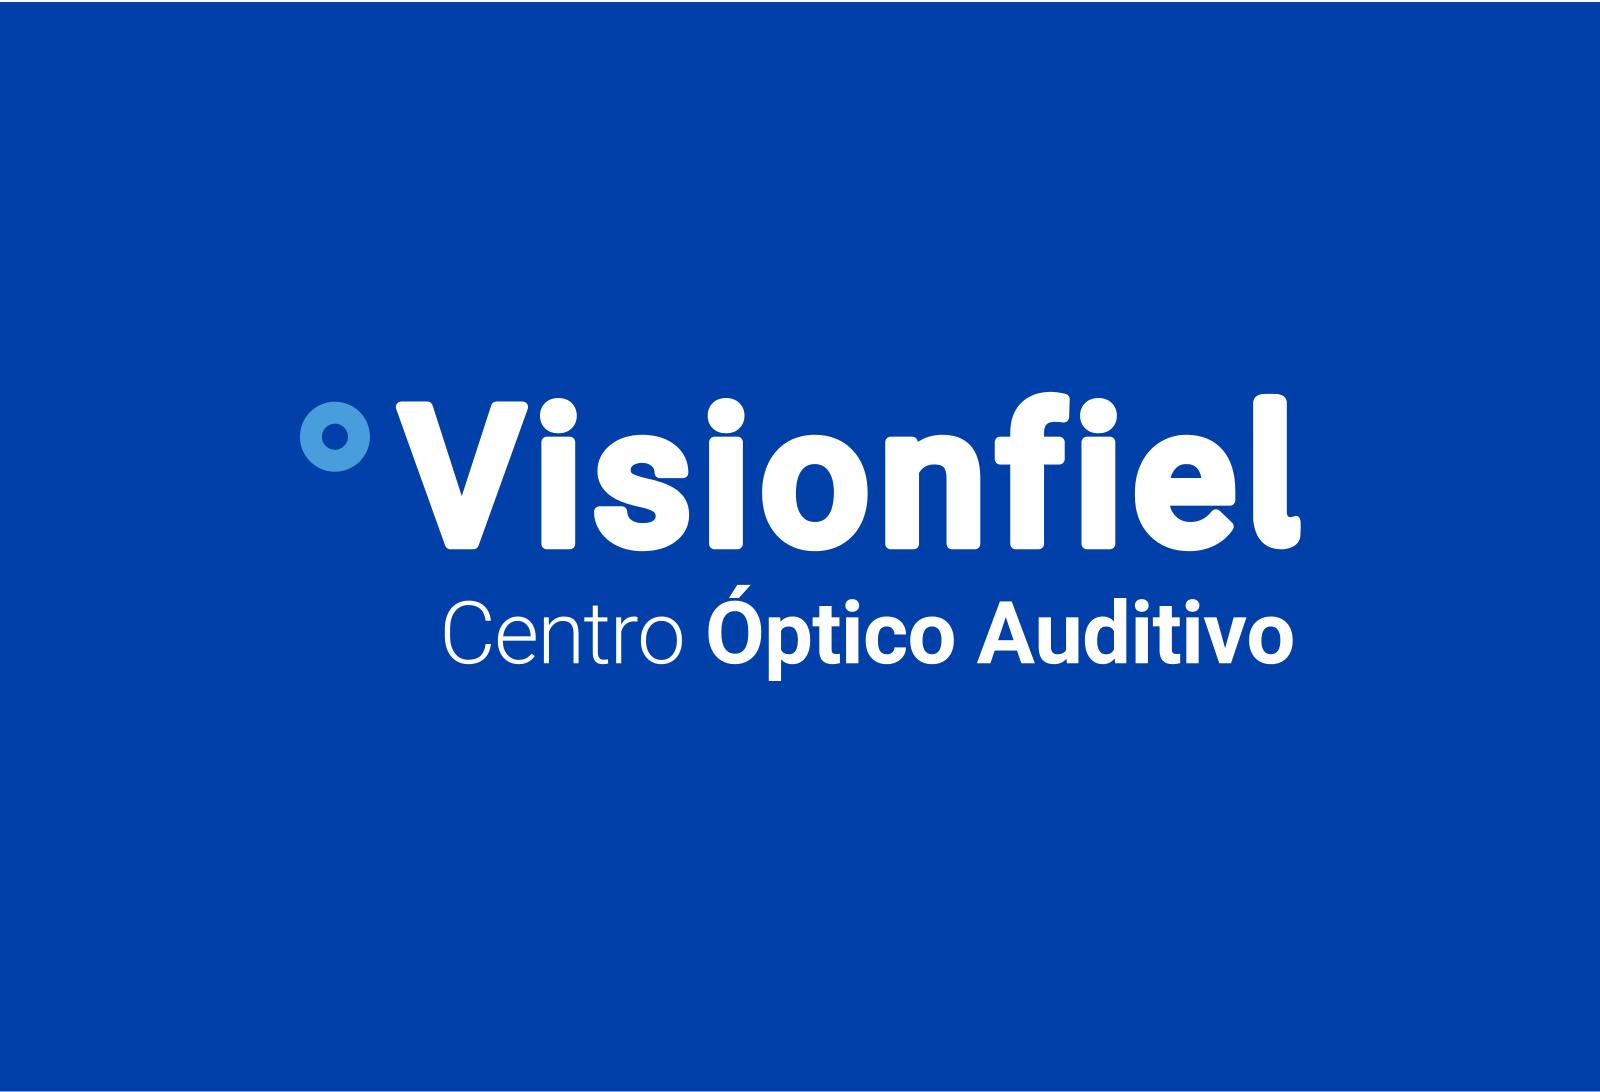 Visionfiel Centro Óptico Auditivo